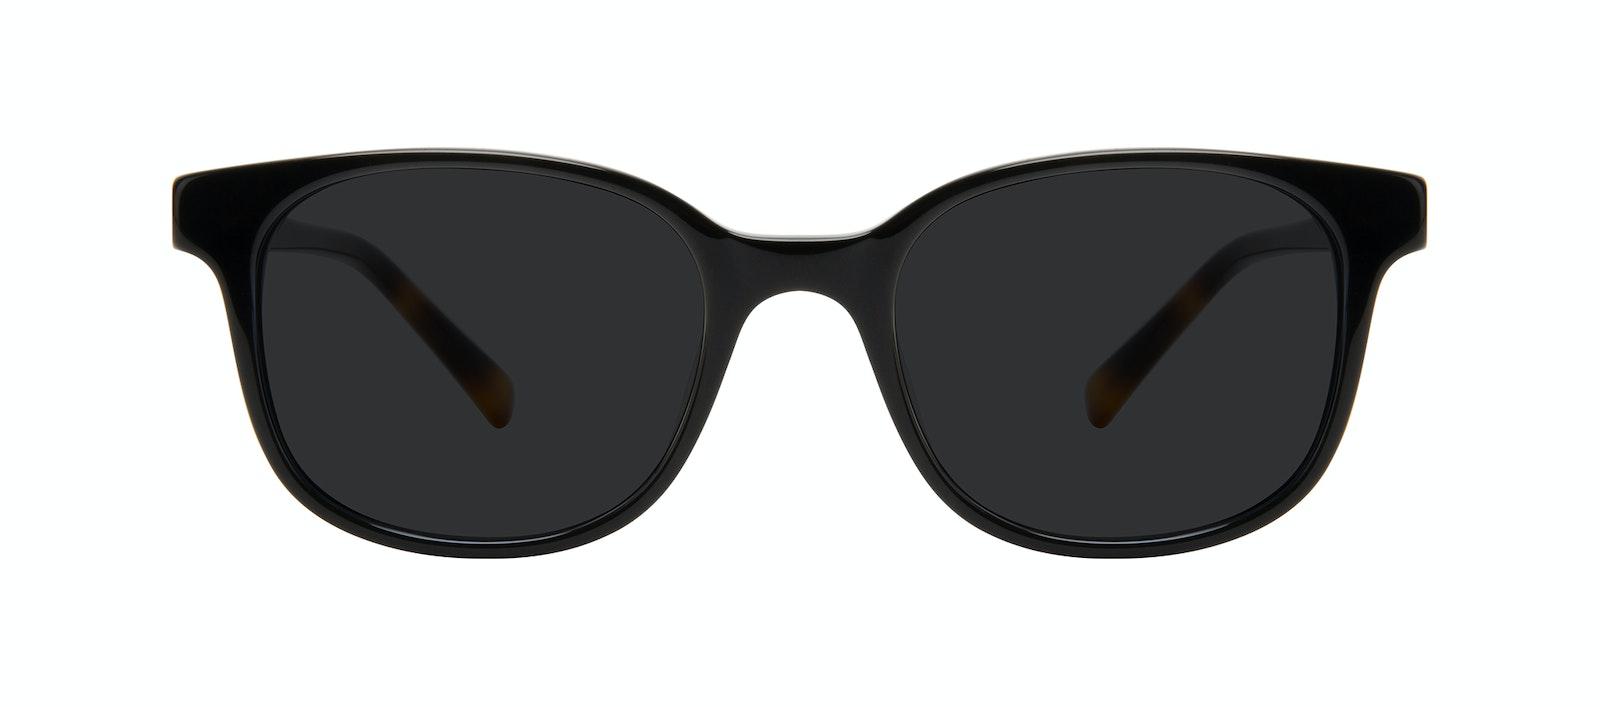 Affordable Fashion Glasses Square Sunglasses Women Unique Onyx Front